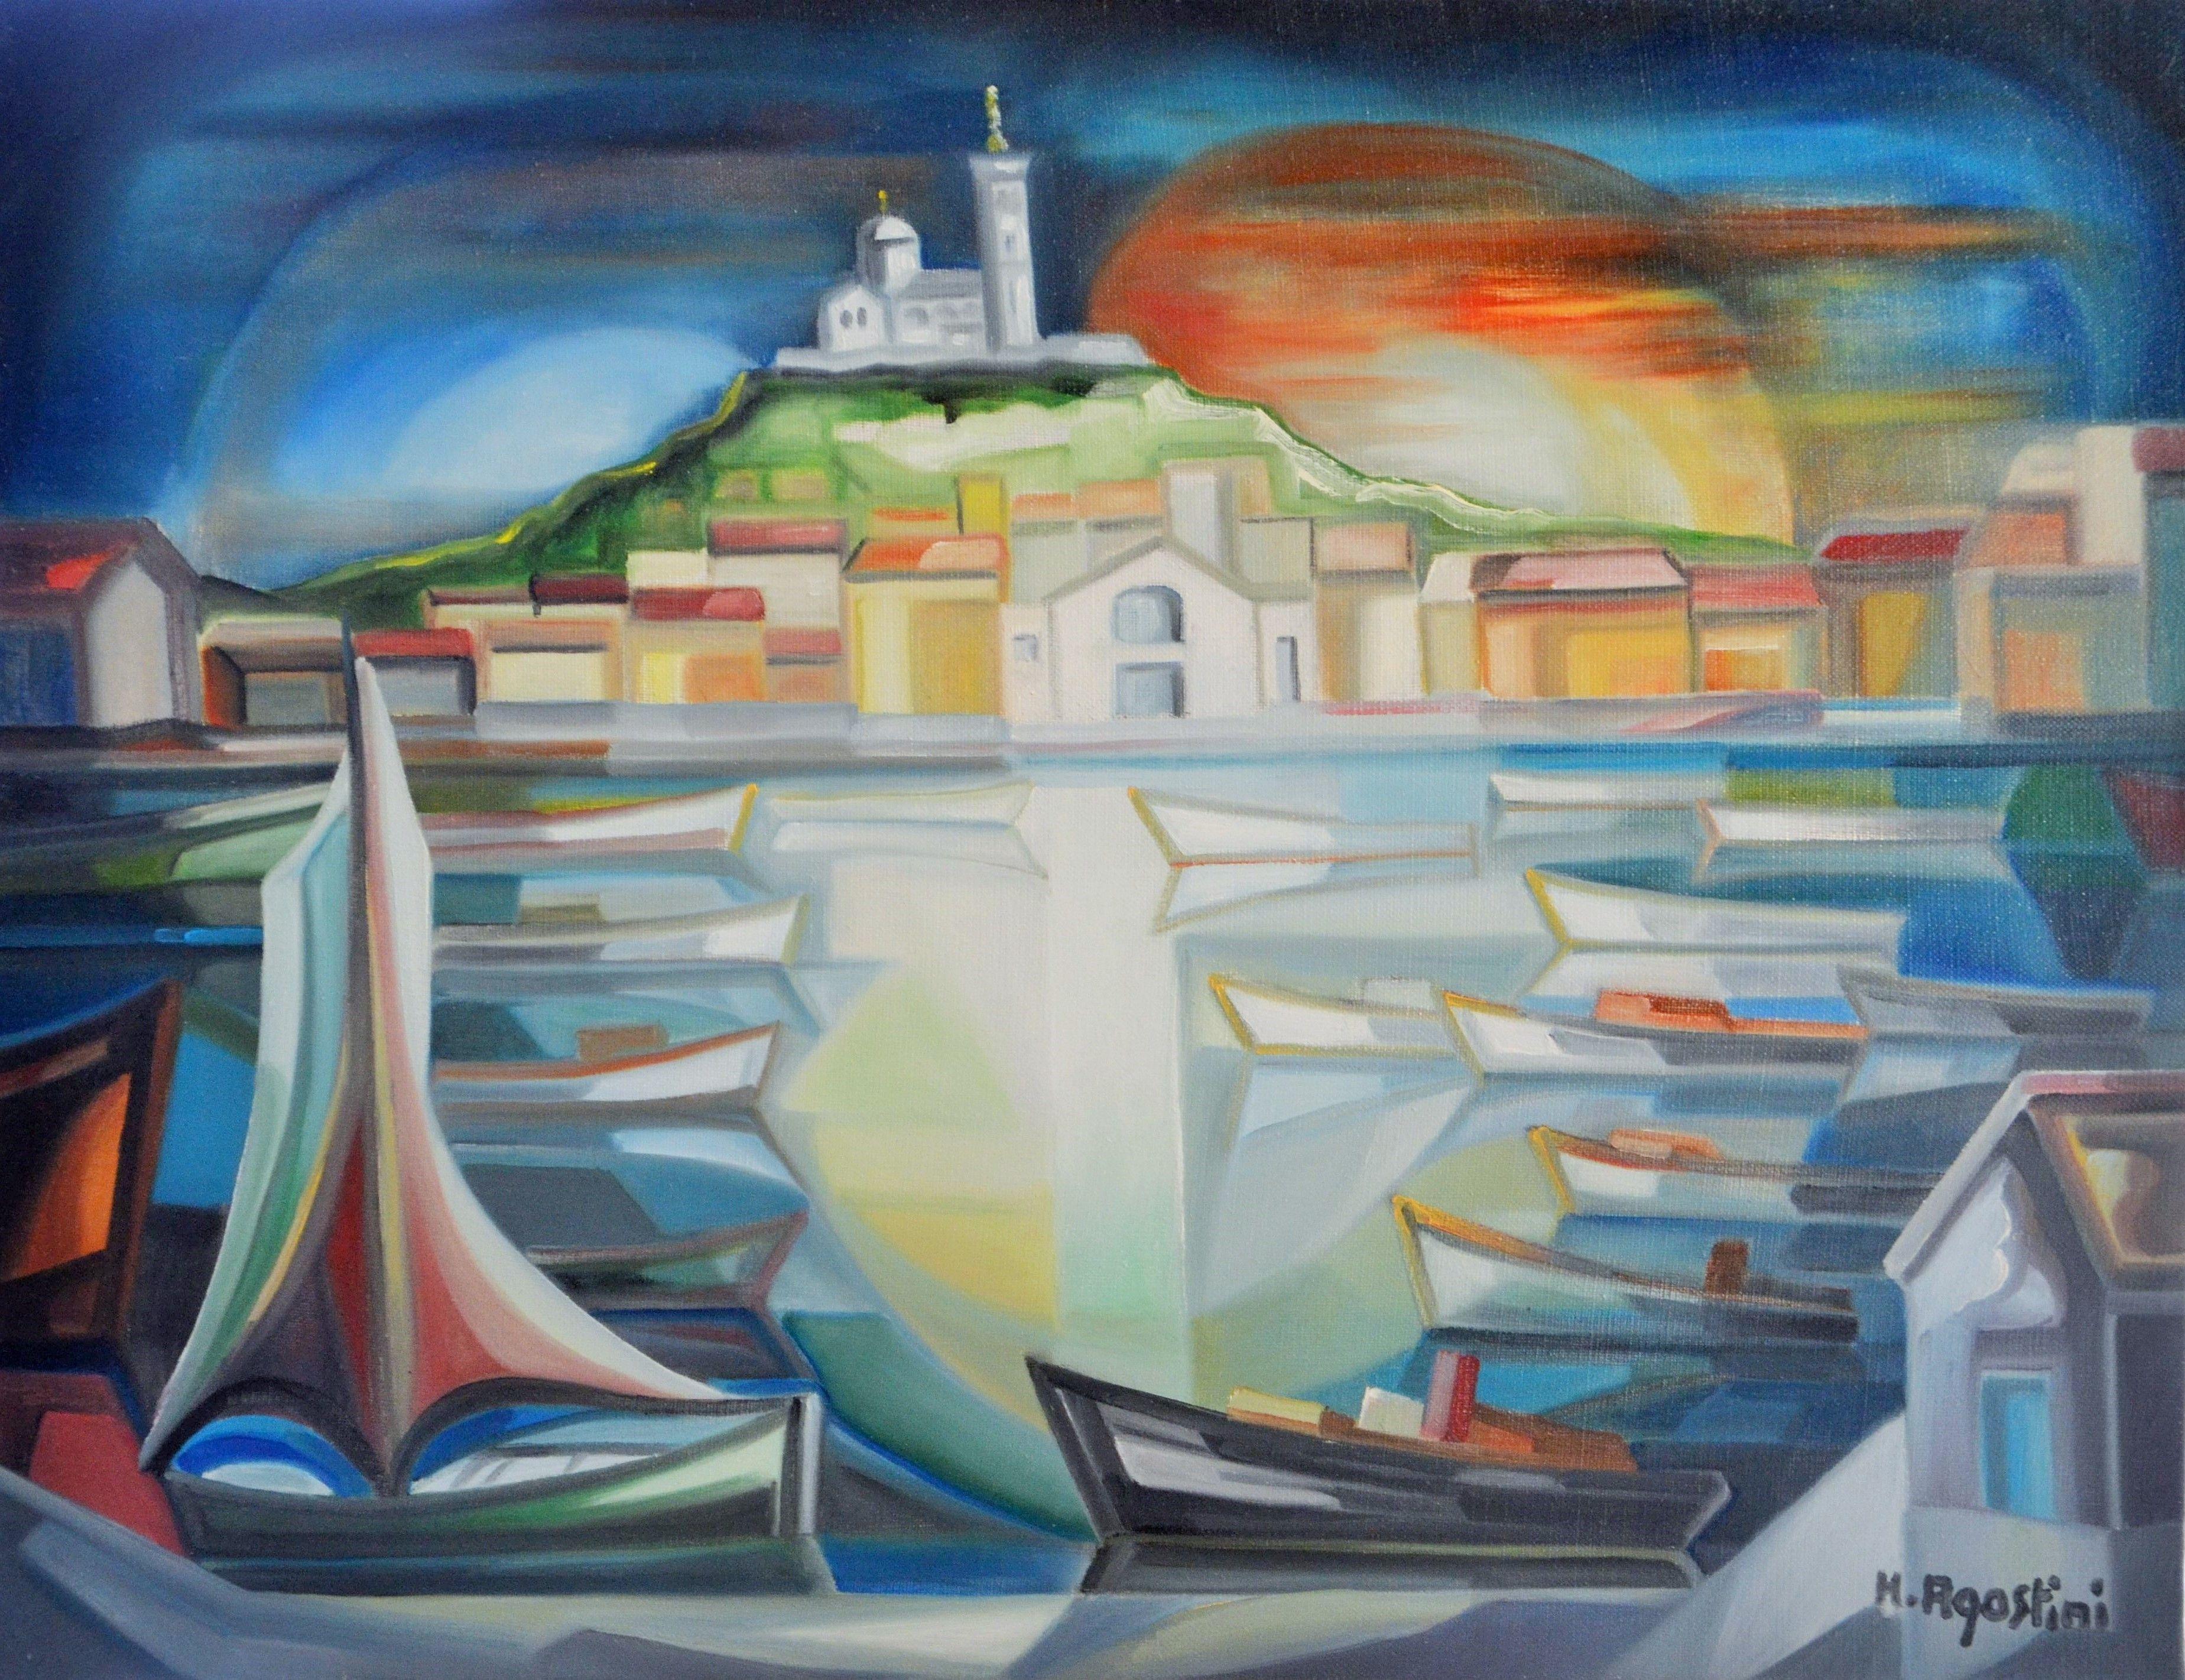 Hubert agostini n marseille en 1935 est un artiste - Artiste peintre marseille ...